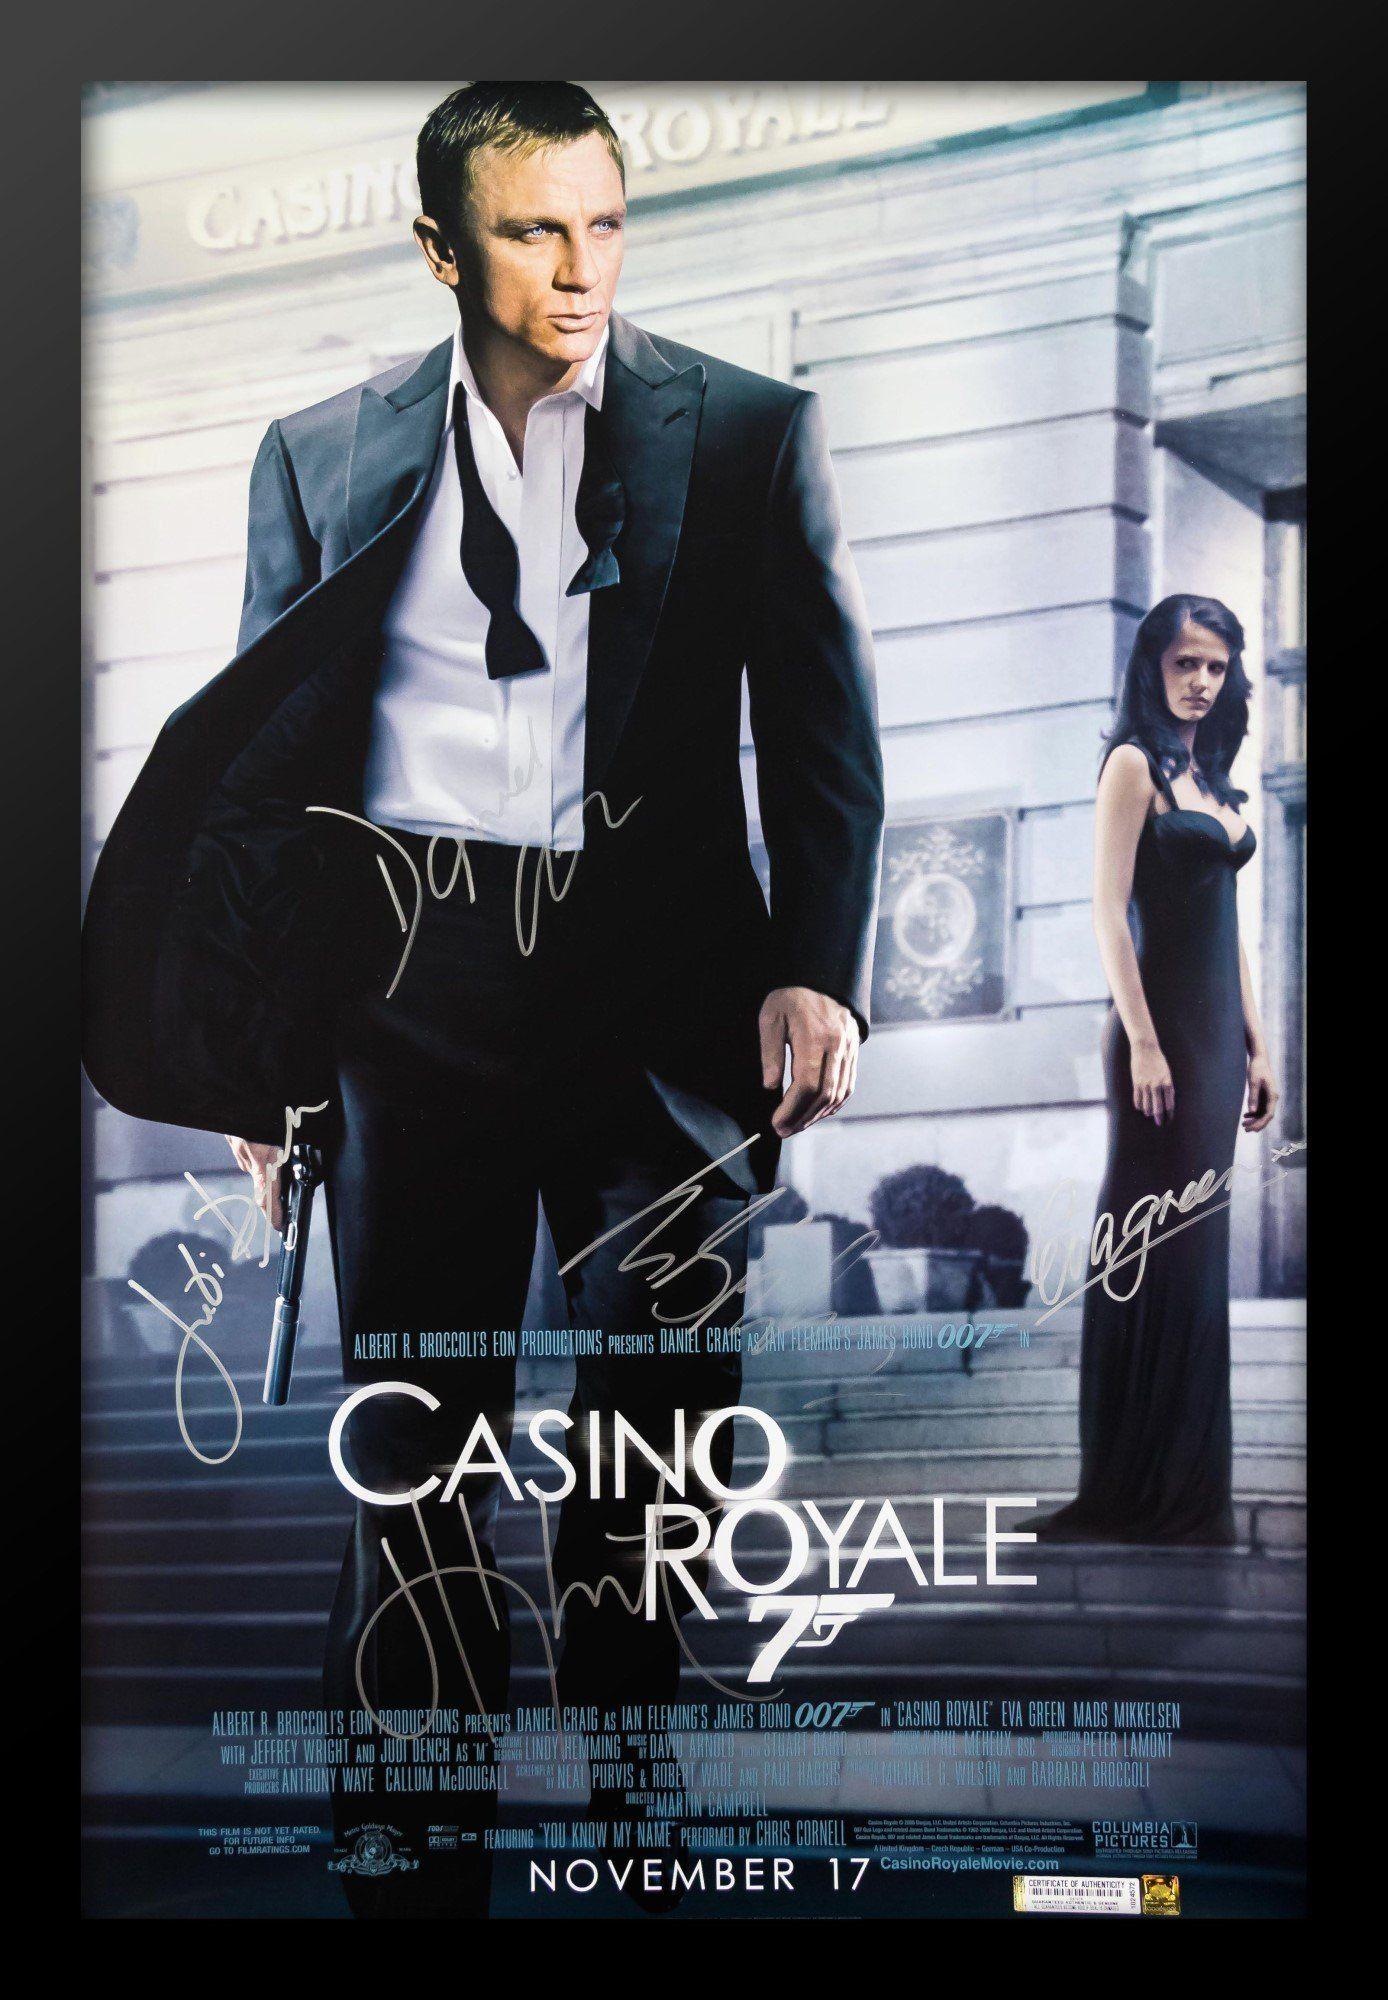 James Bond Casino Royale Full Movie Free Online In Hindi